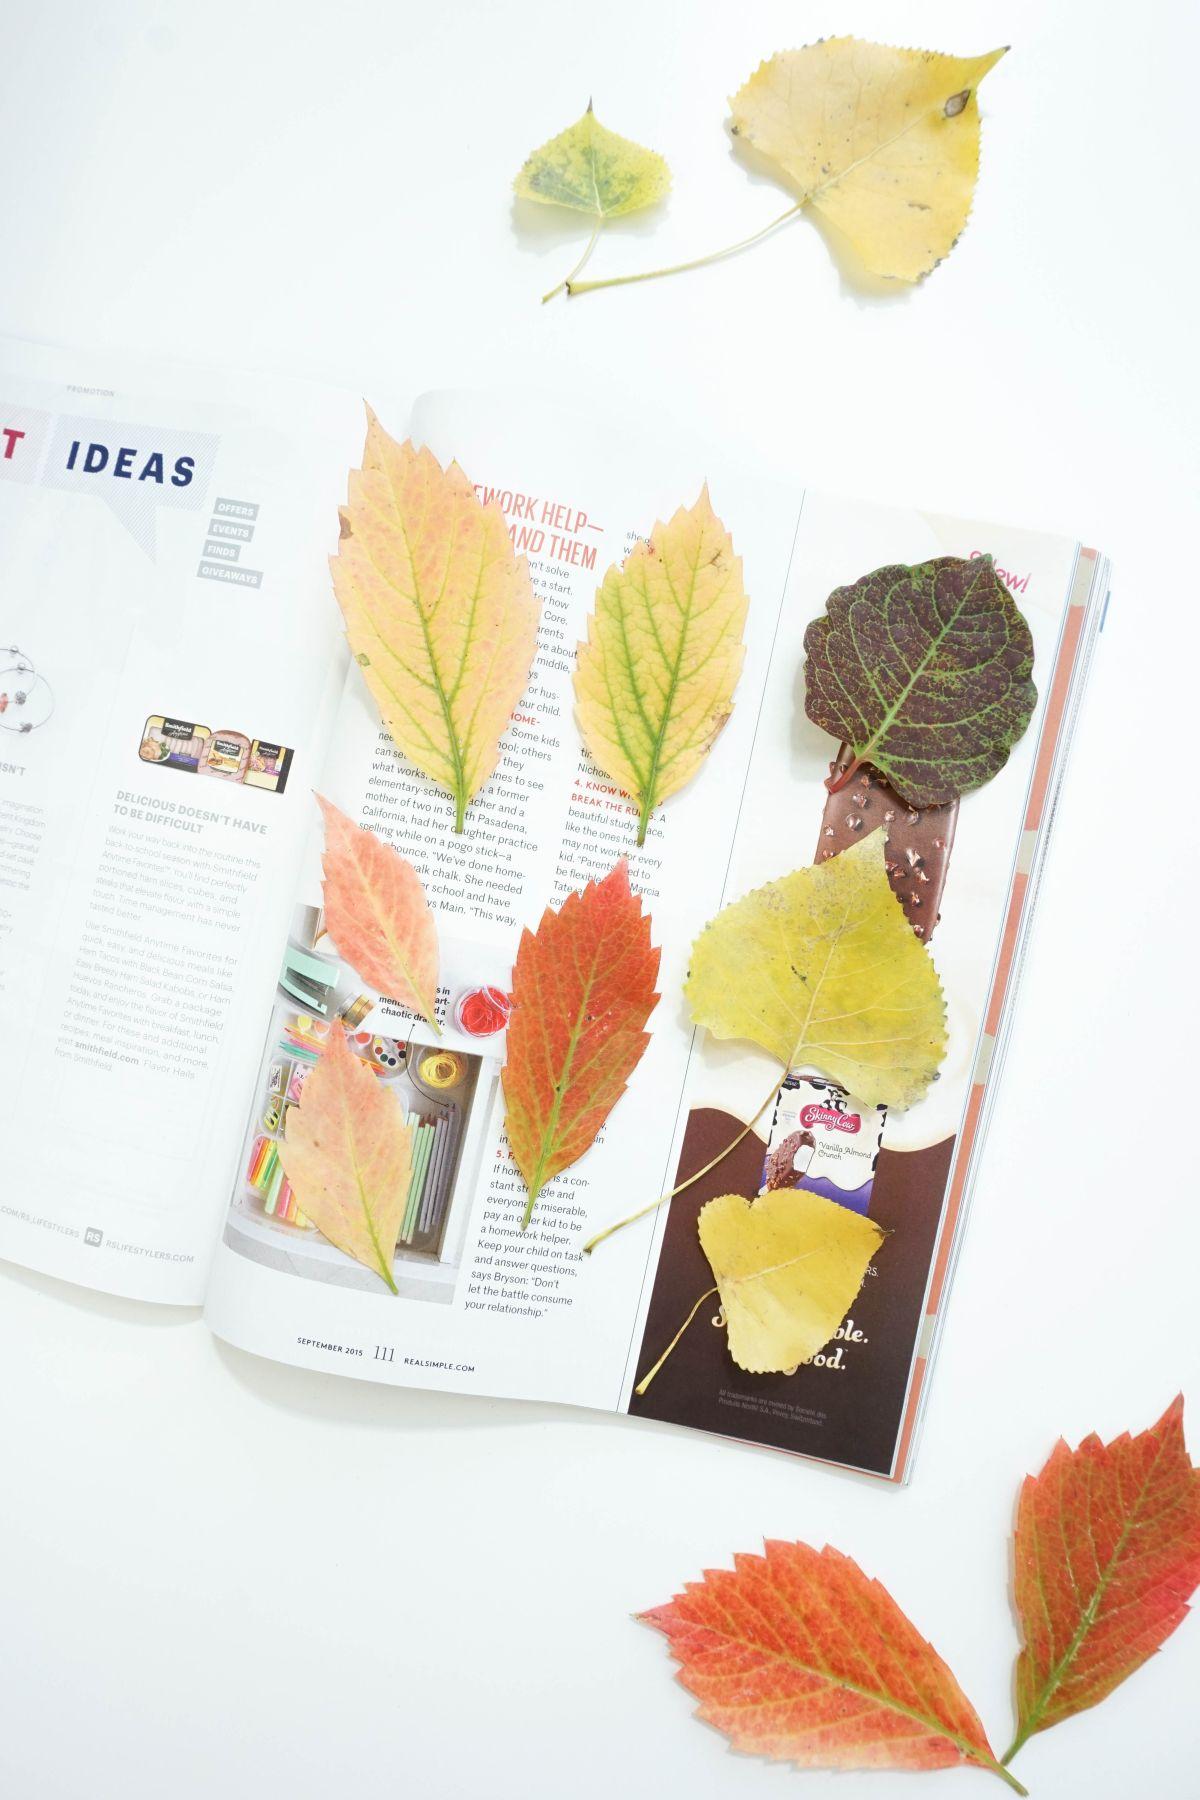 Dry in Magazines